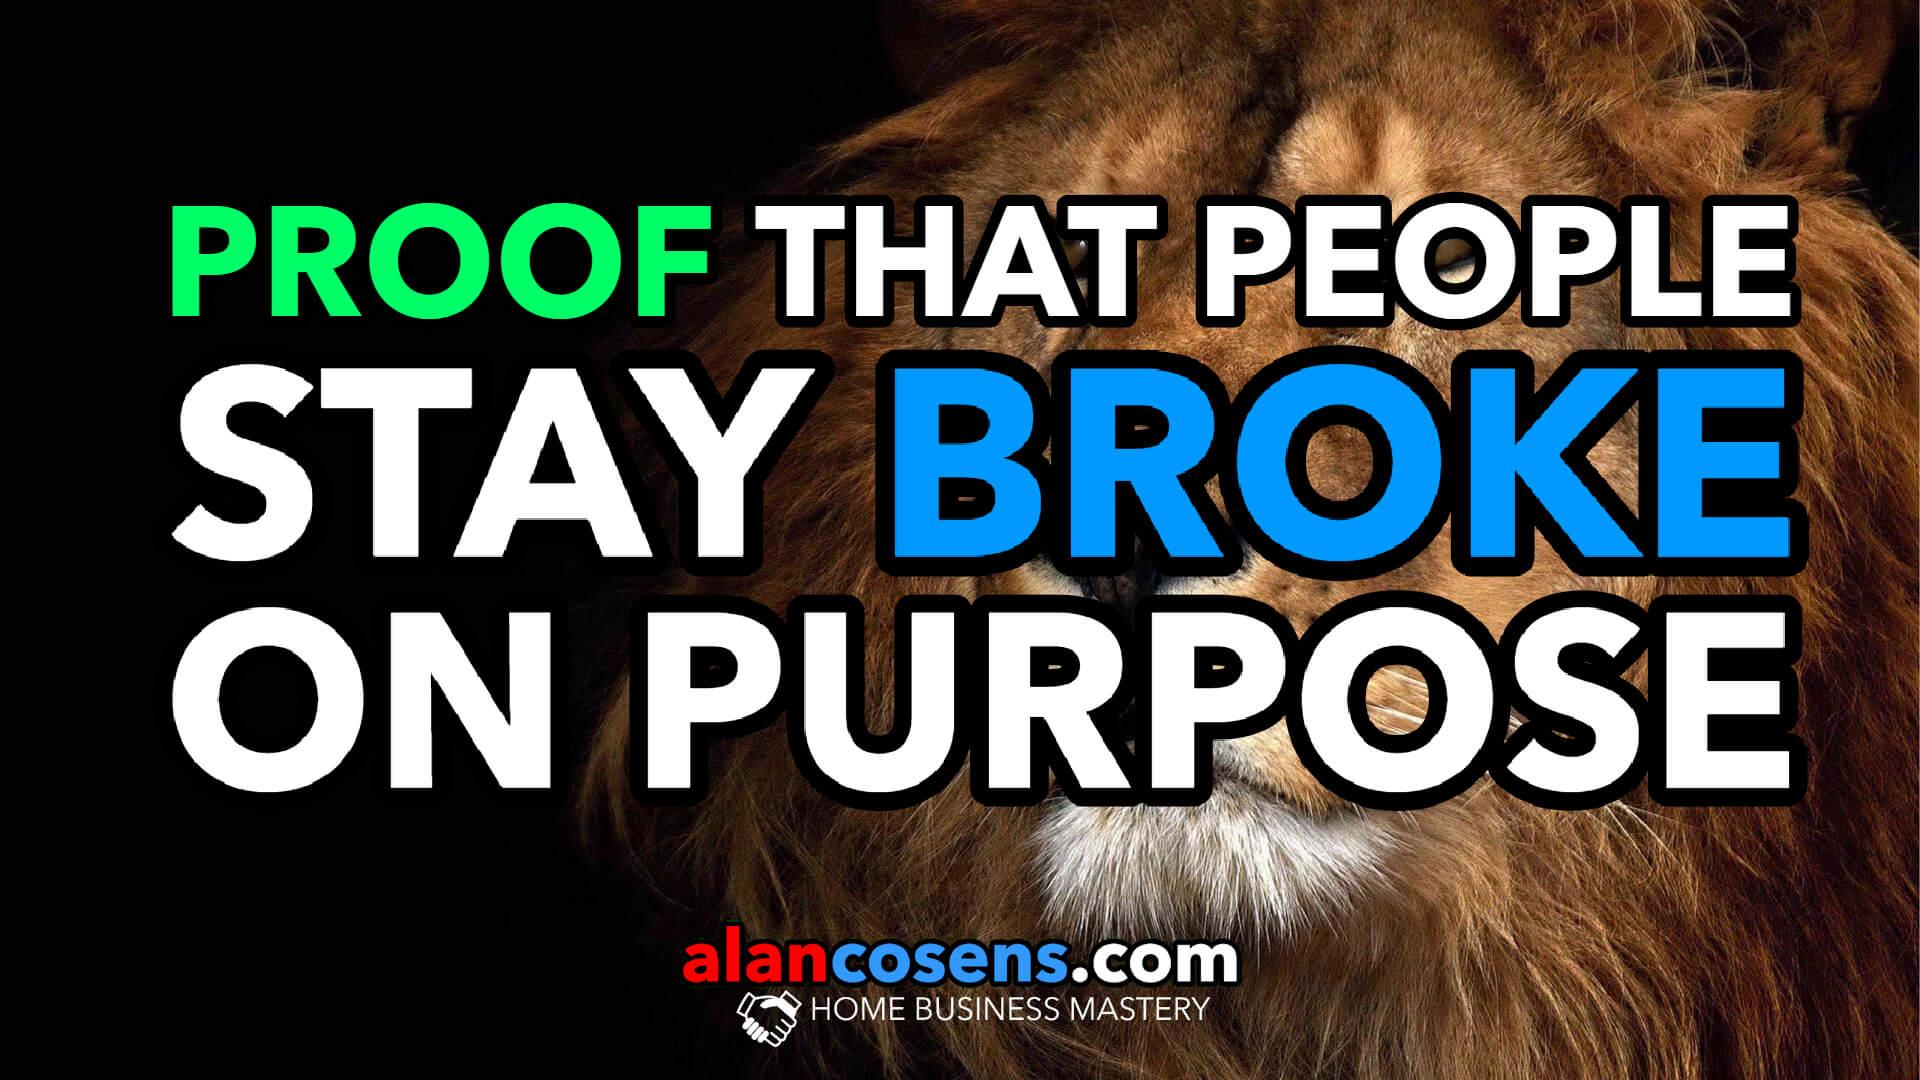 Proof That People Stay Broke On Purpose